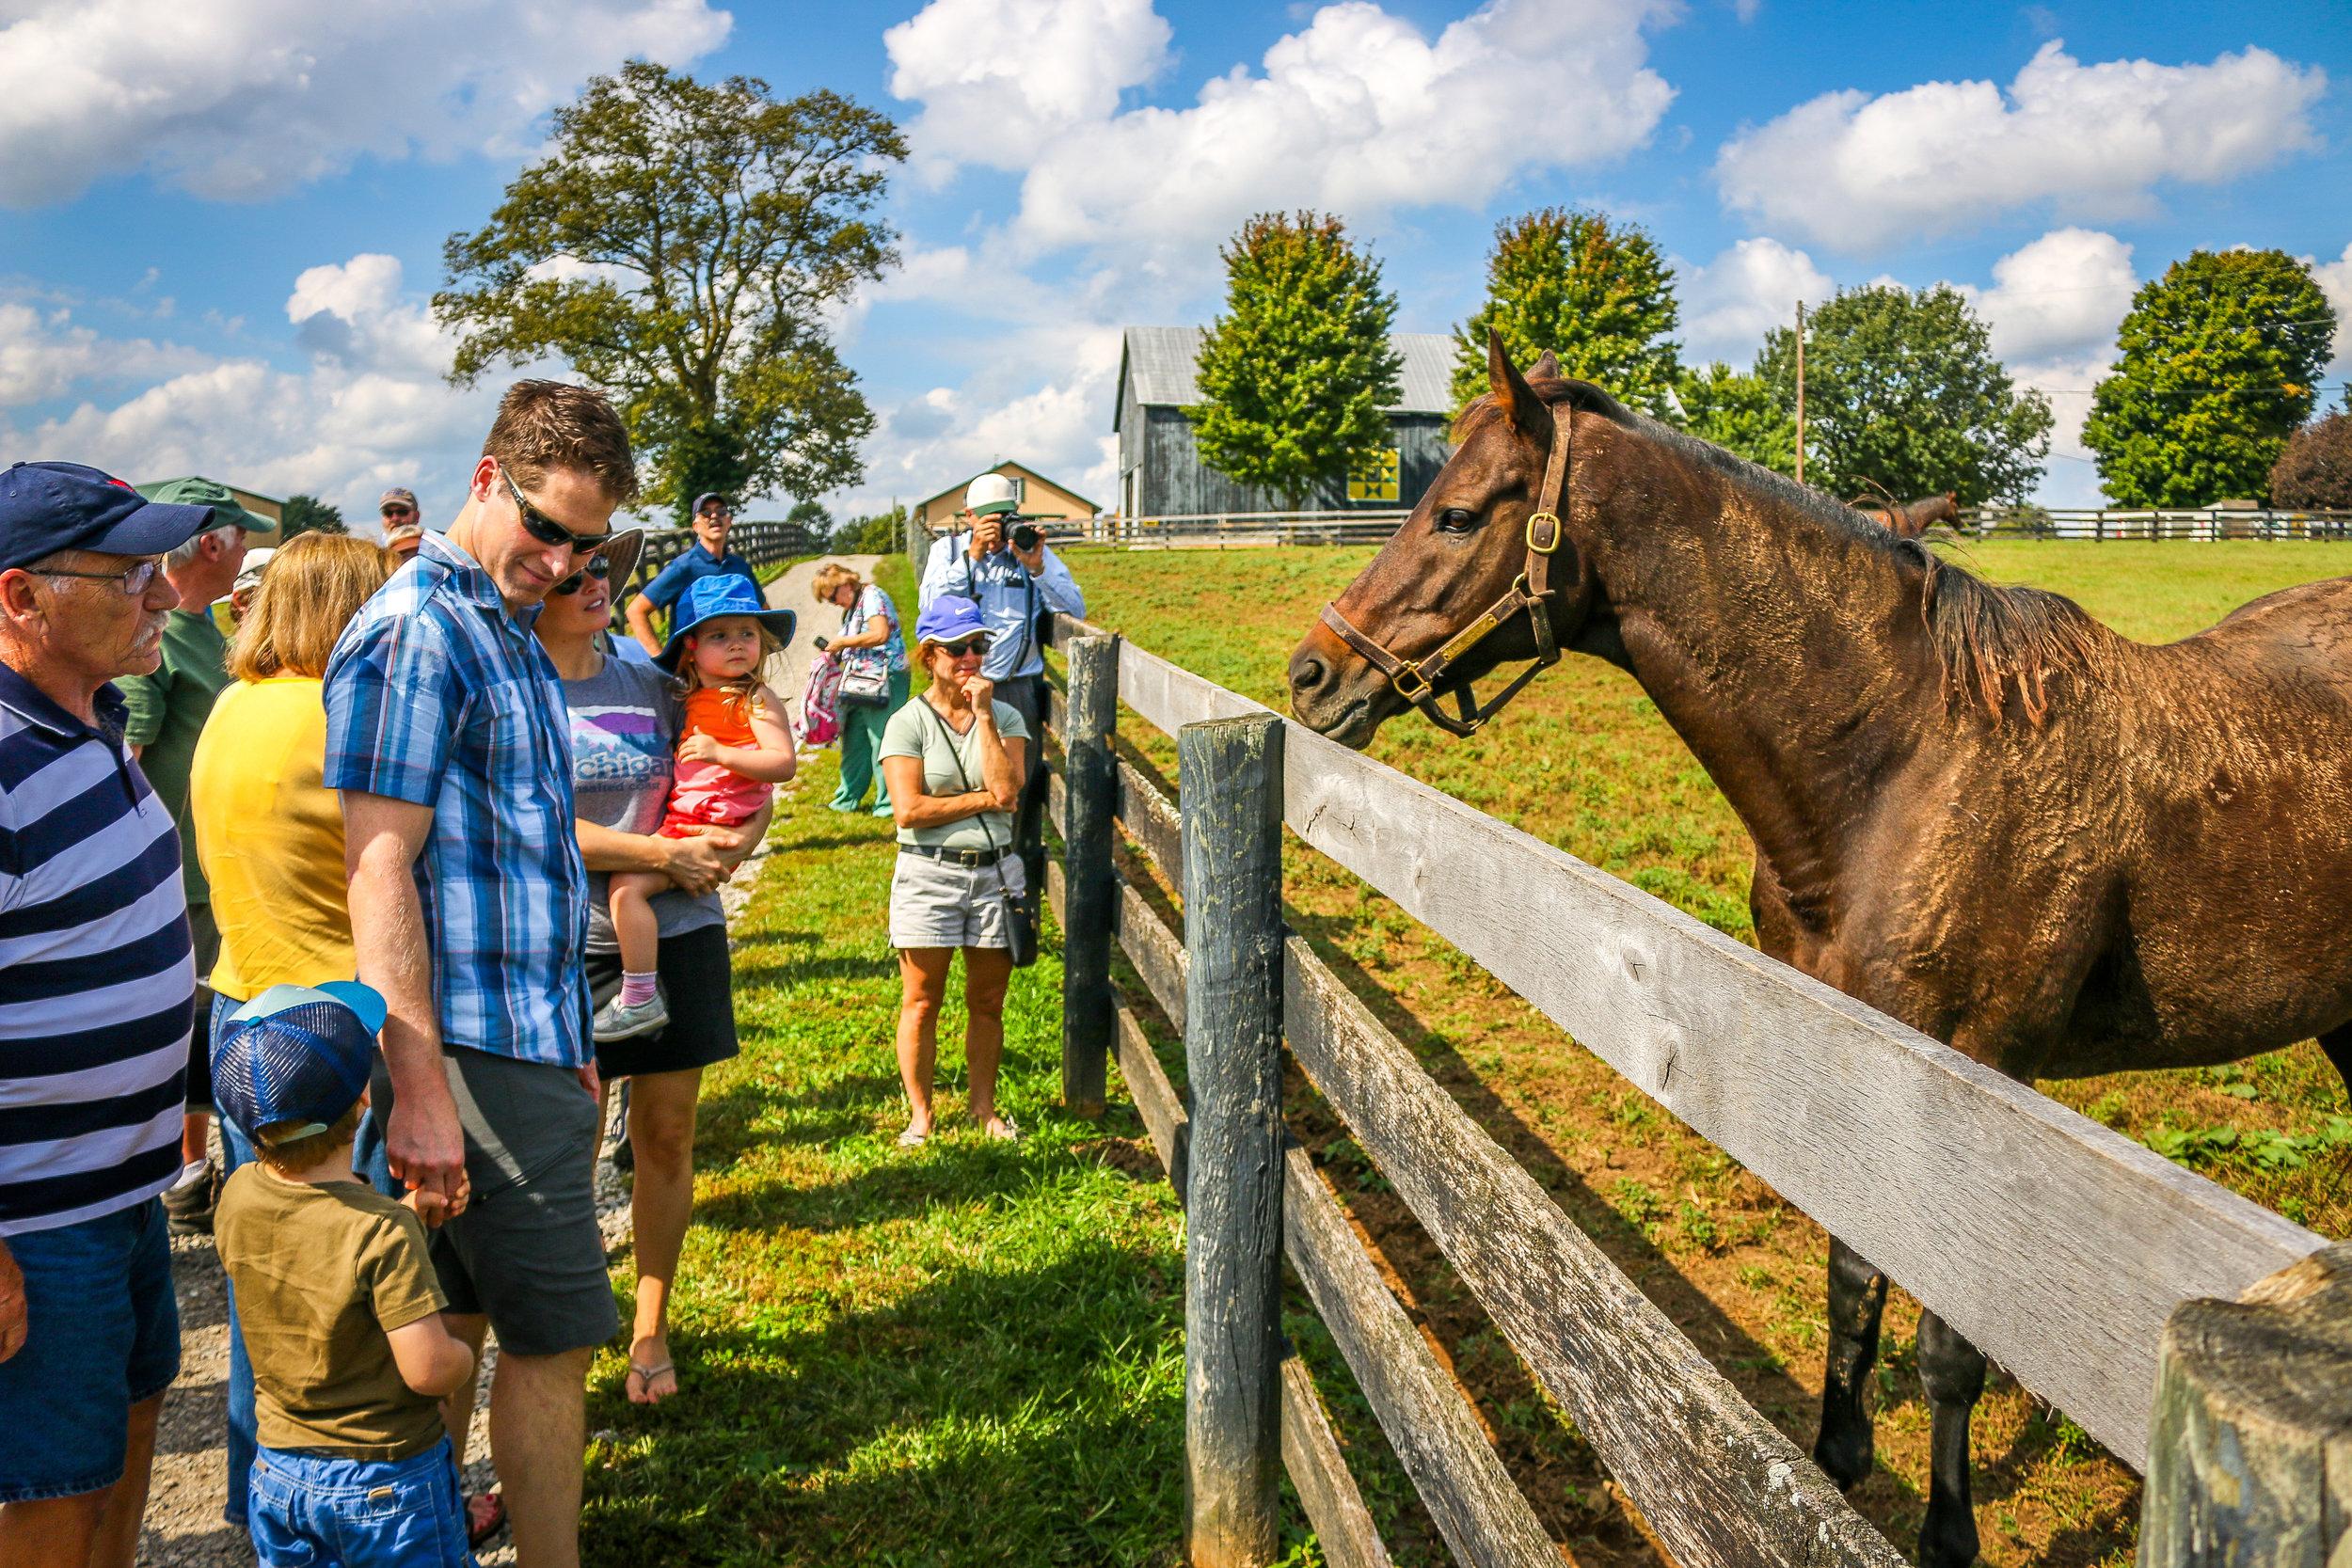 old friends horse farm lexington georgetown kentucky